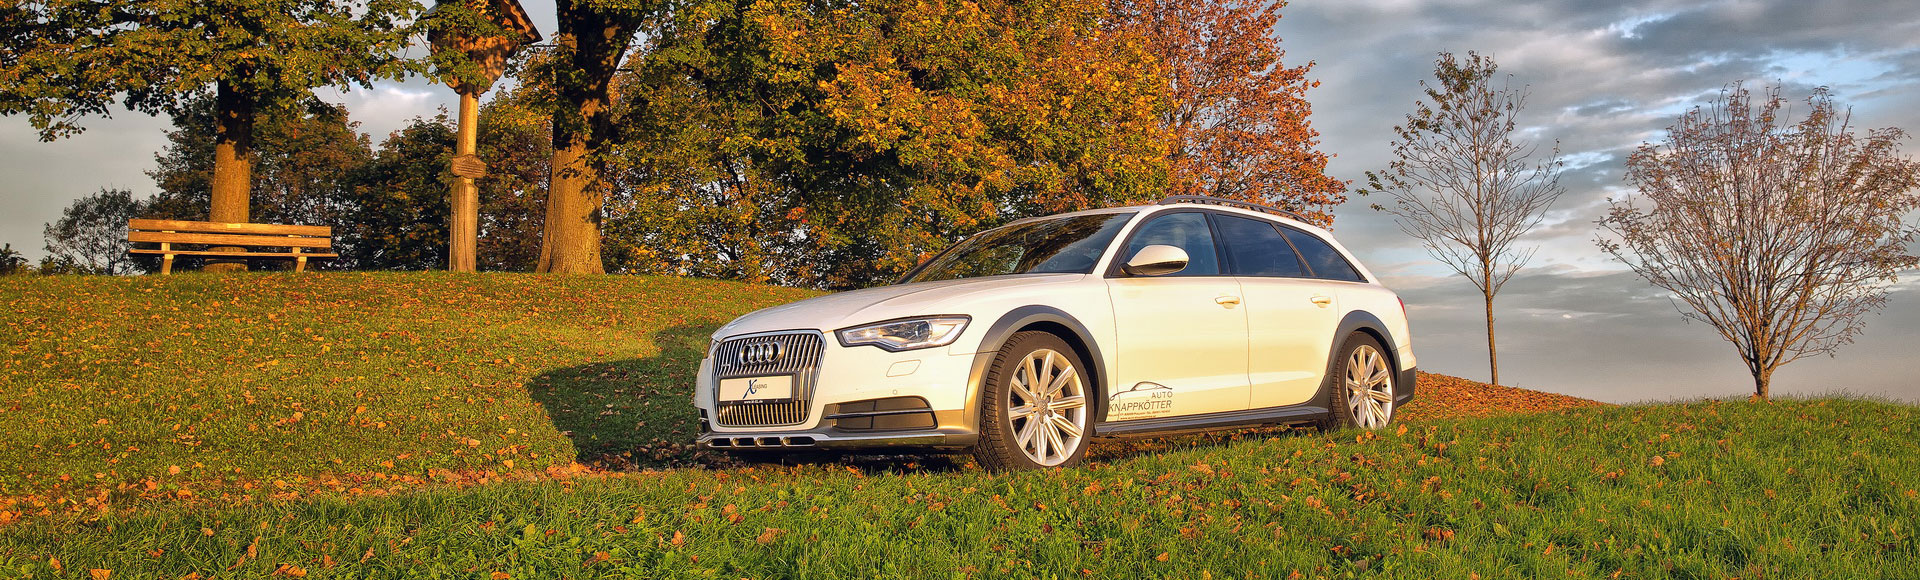 Audi A6 Allroad 2014 Herbst 3743